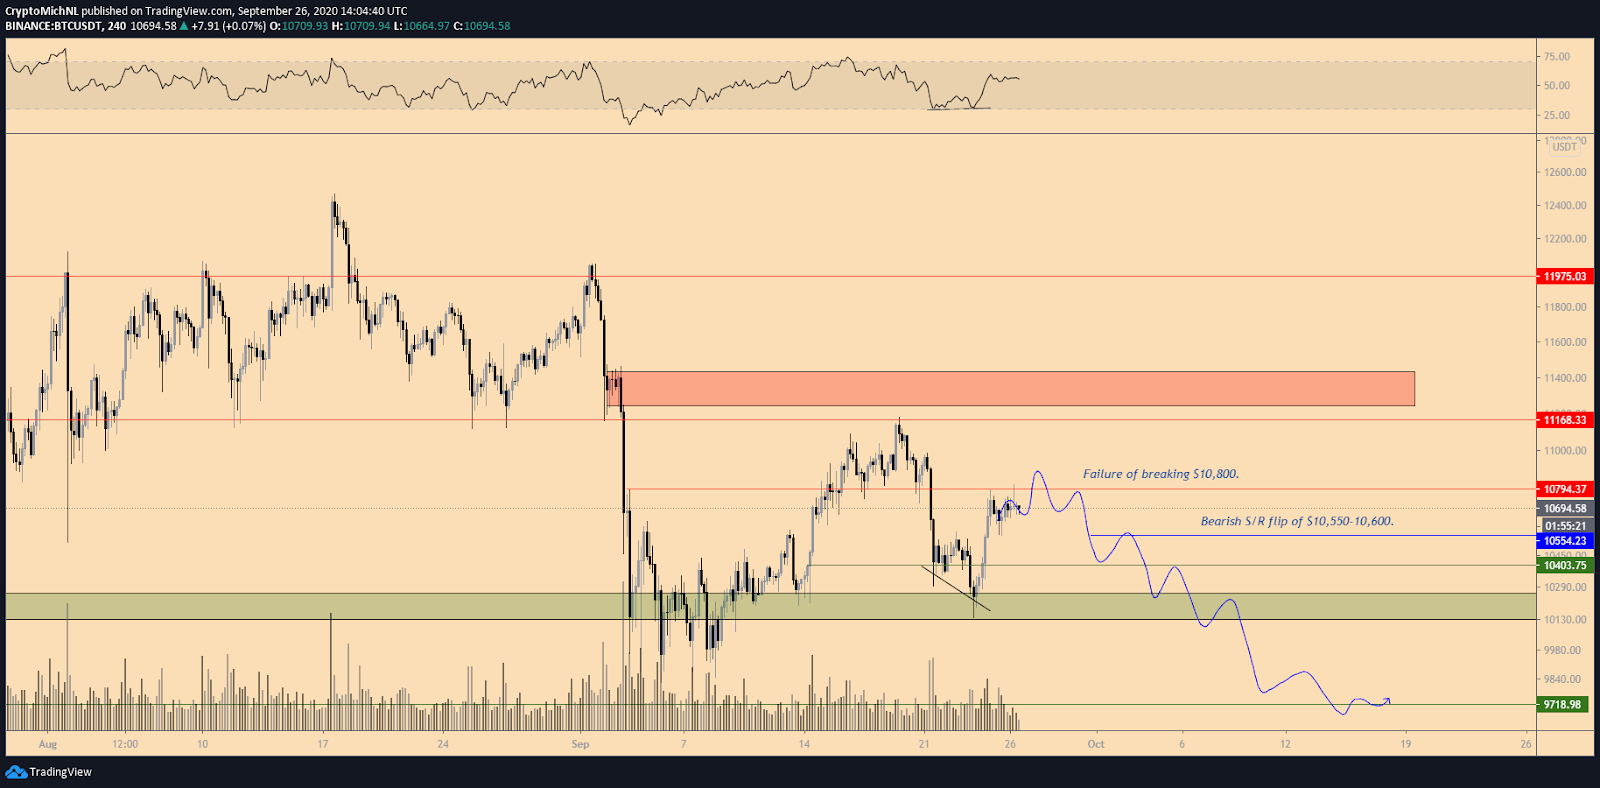 BTC/USD 4-hour chart bearish scenario. Source: TradingView